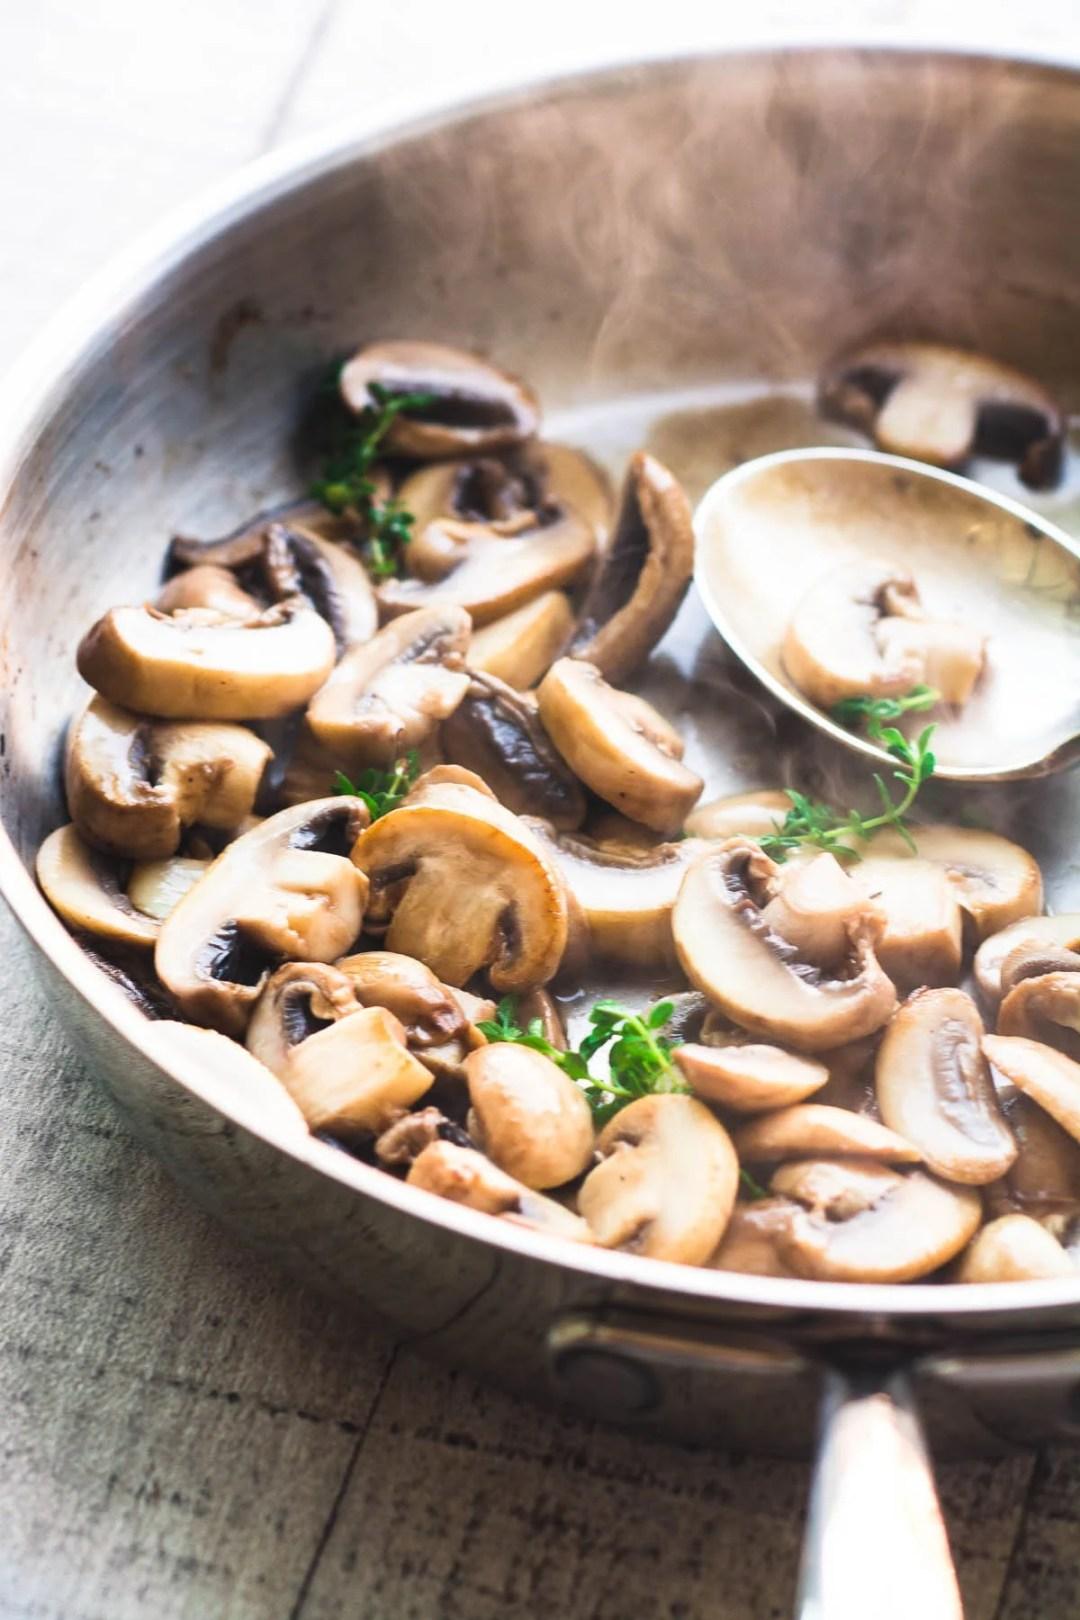 sautéing mushrooms for Instant Pot pork chops with creamy mushroom sauce